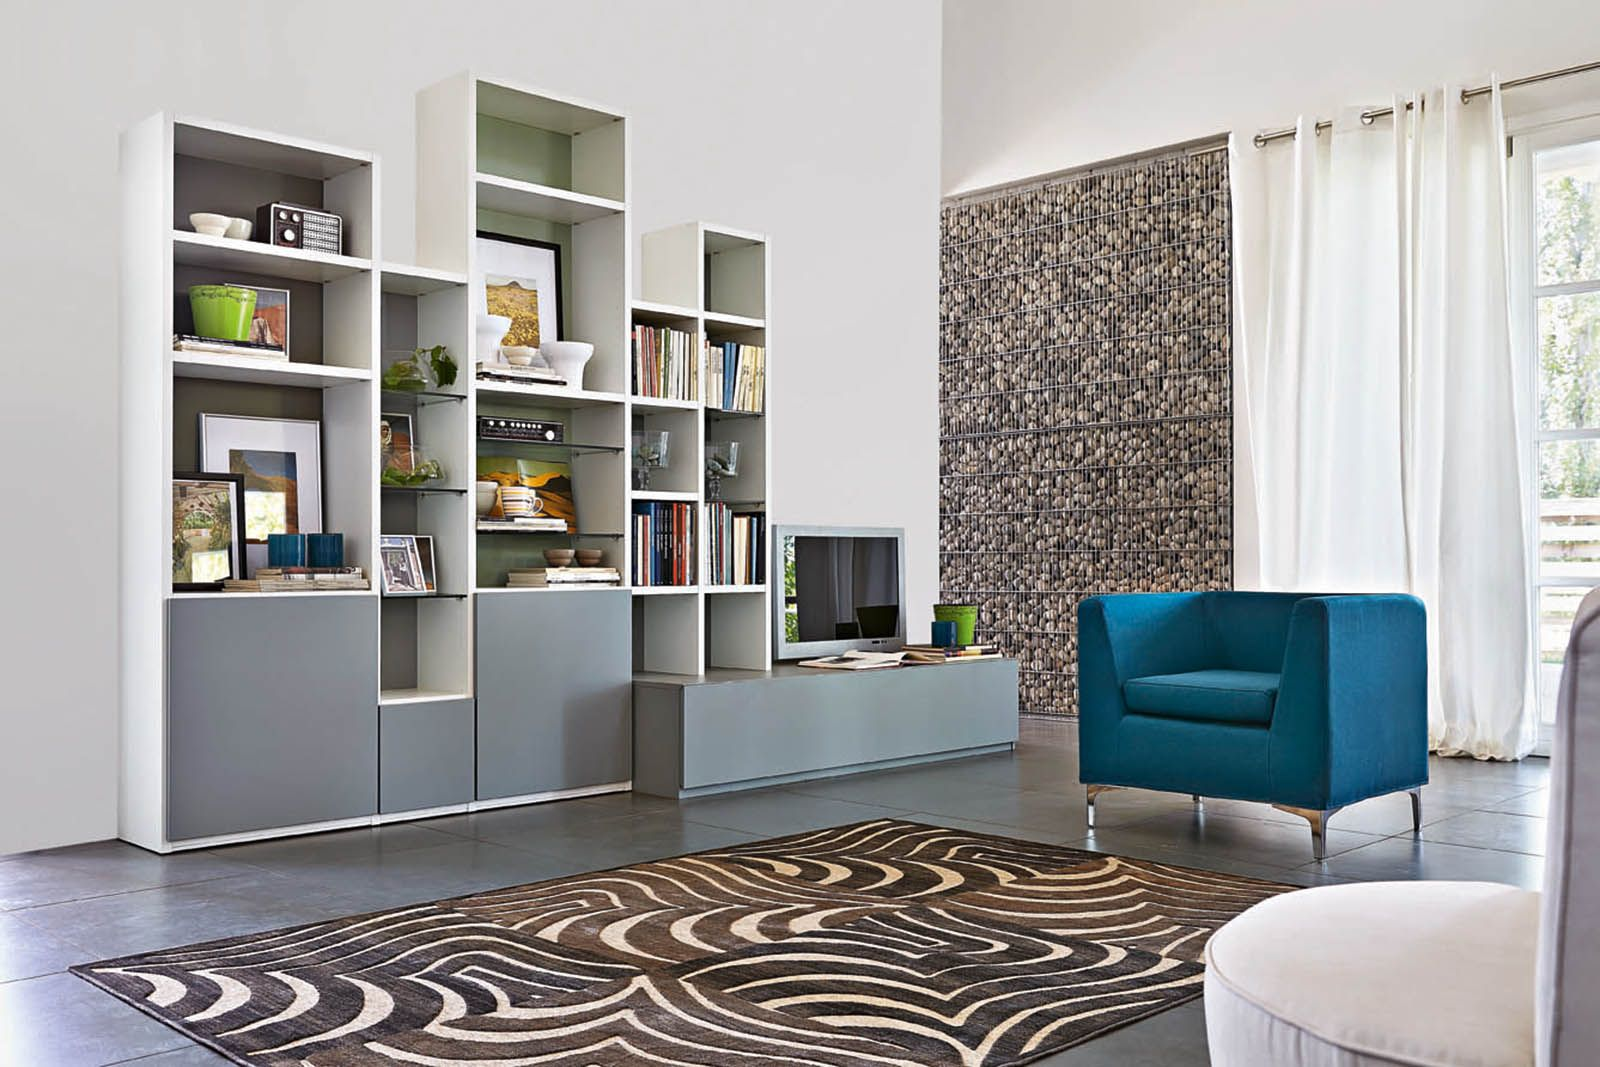 Stunning Ikea Soggiorno Componibile Images - House Design Ideas ...